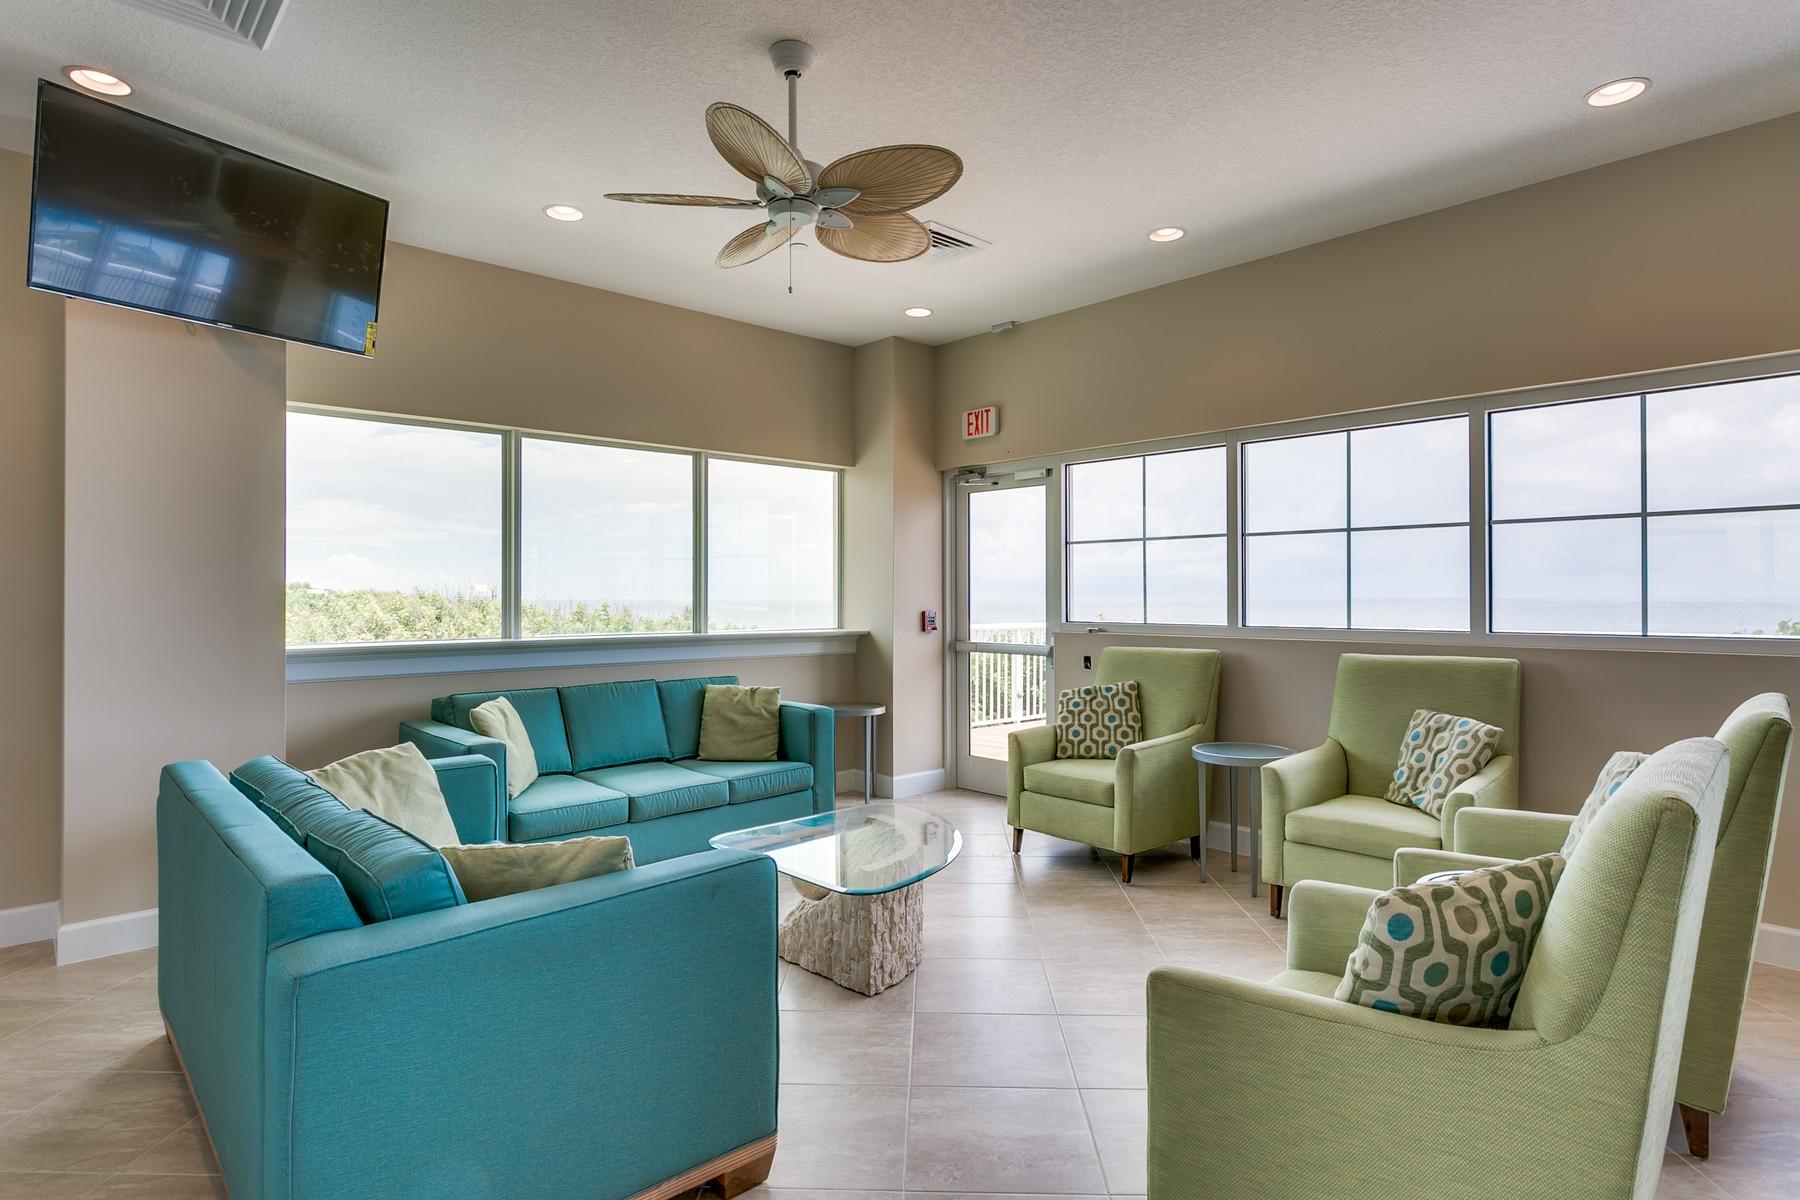 Additional photo for property listing at Crane Point Duplex 843 Aquarina Blvd. Melbourne Beach, Florida 32951 United States